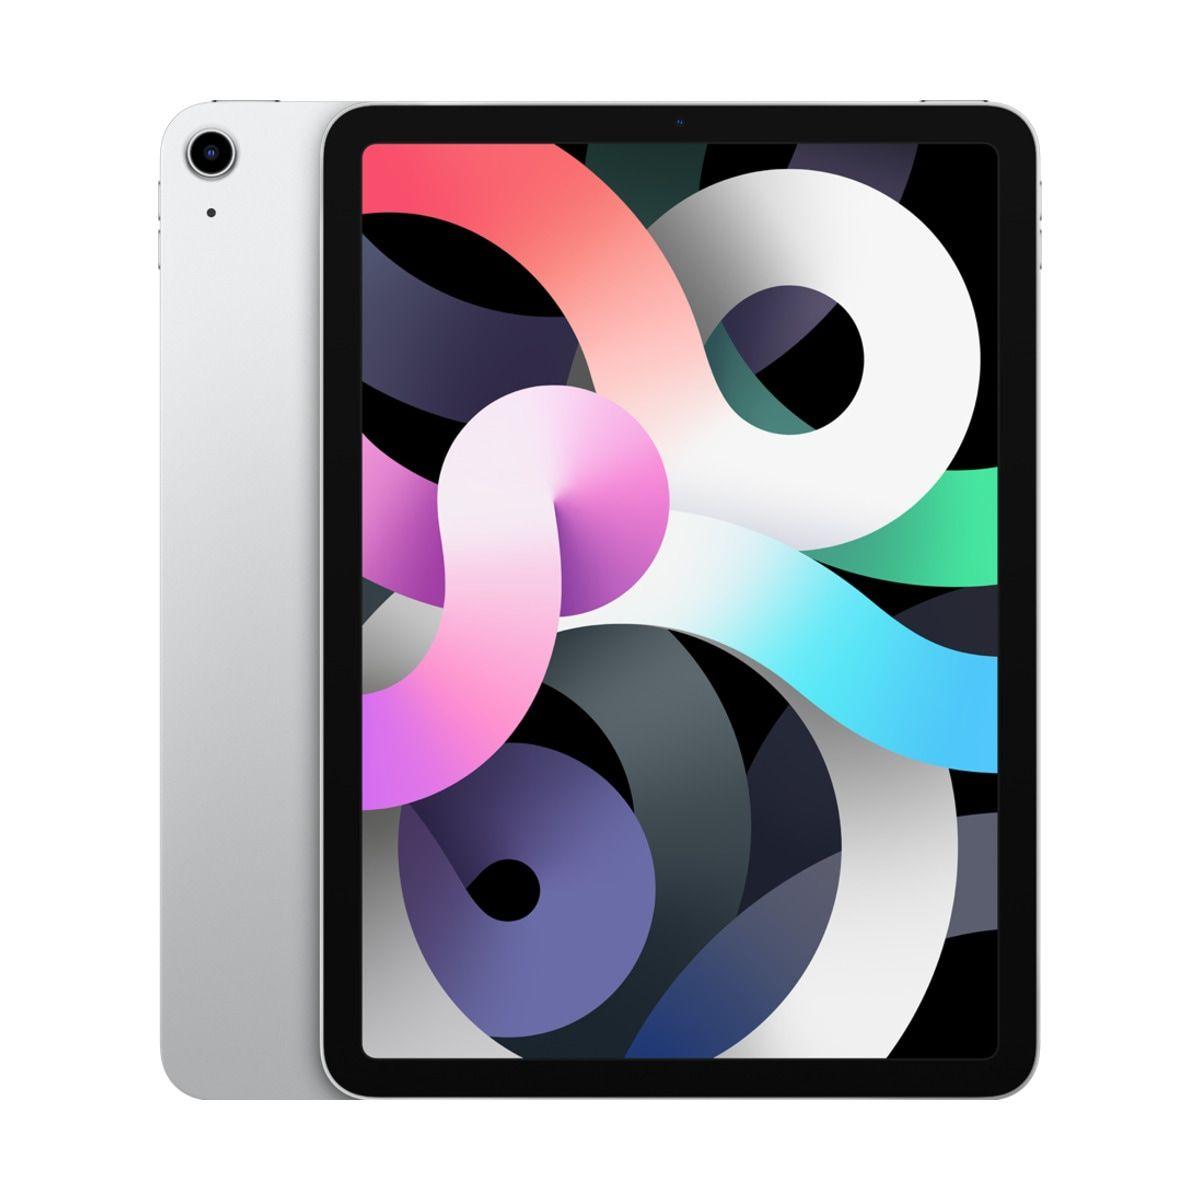 Apple iPad Air Wi-Fi+Cell 64GB - Silver